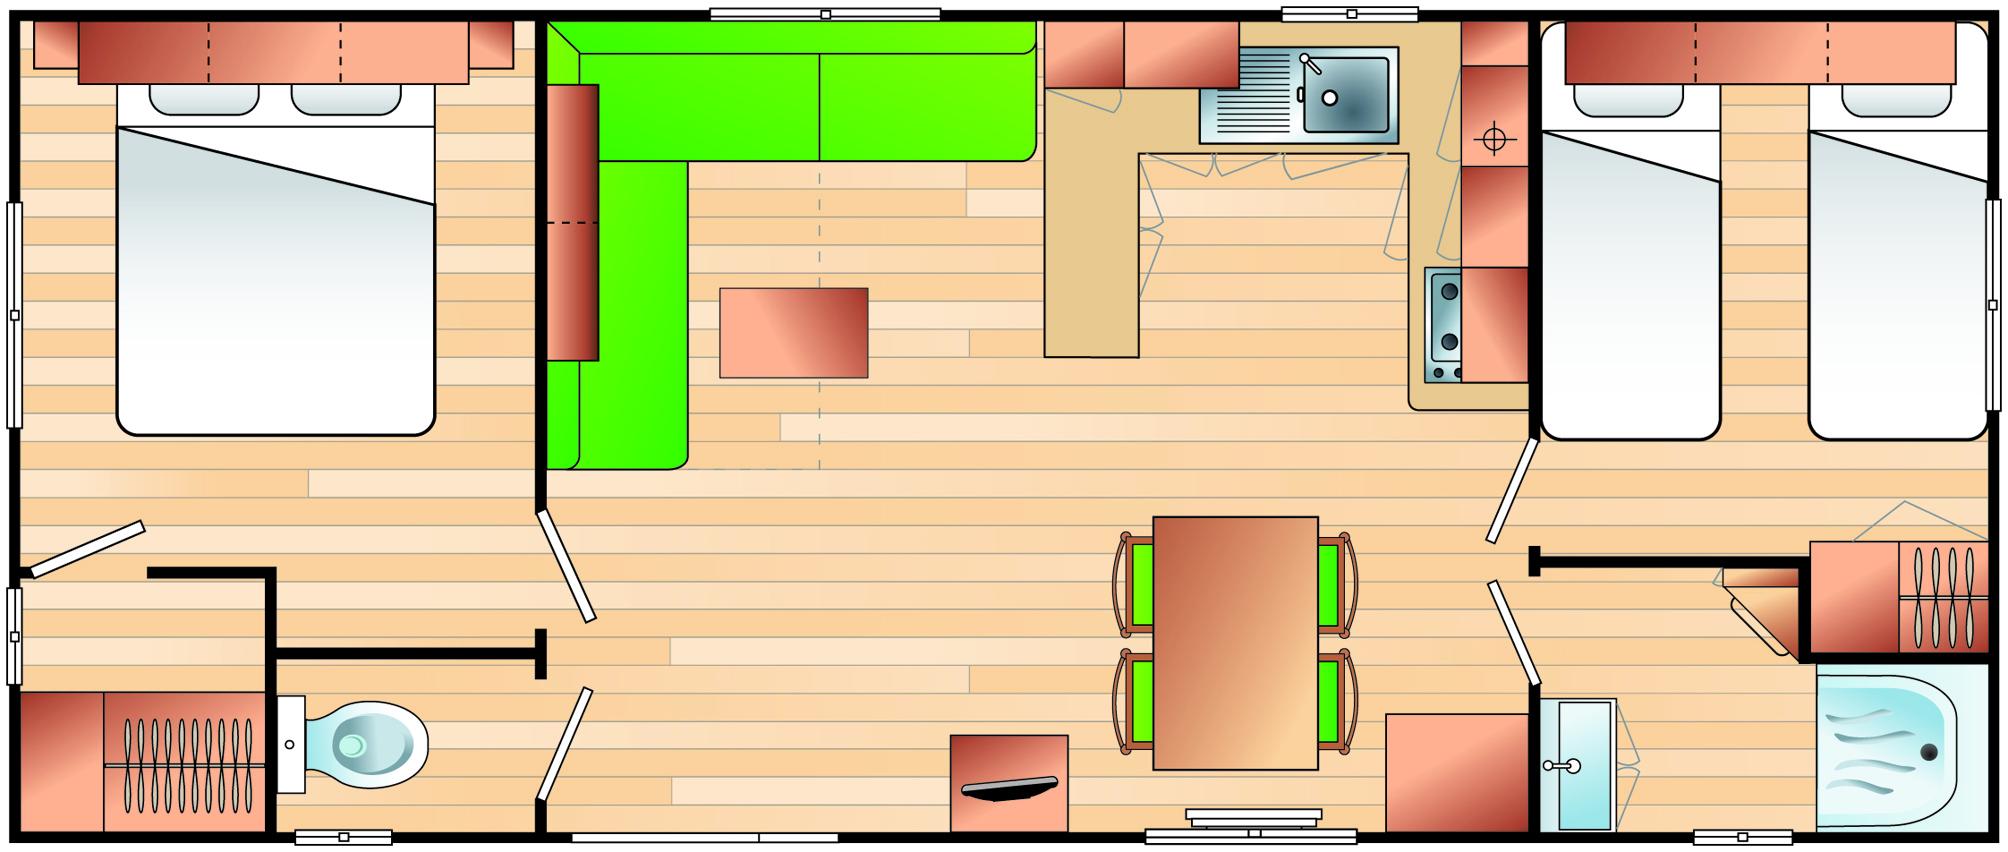 Irm Selenia - 2009 - Mobil home d'occasion - 10 000€ - Zen Mobil homes